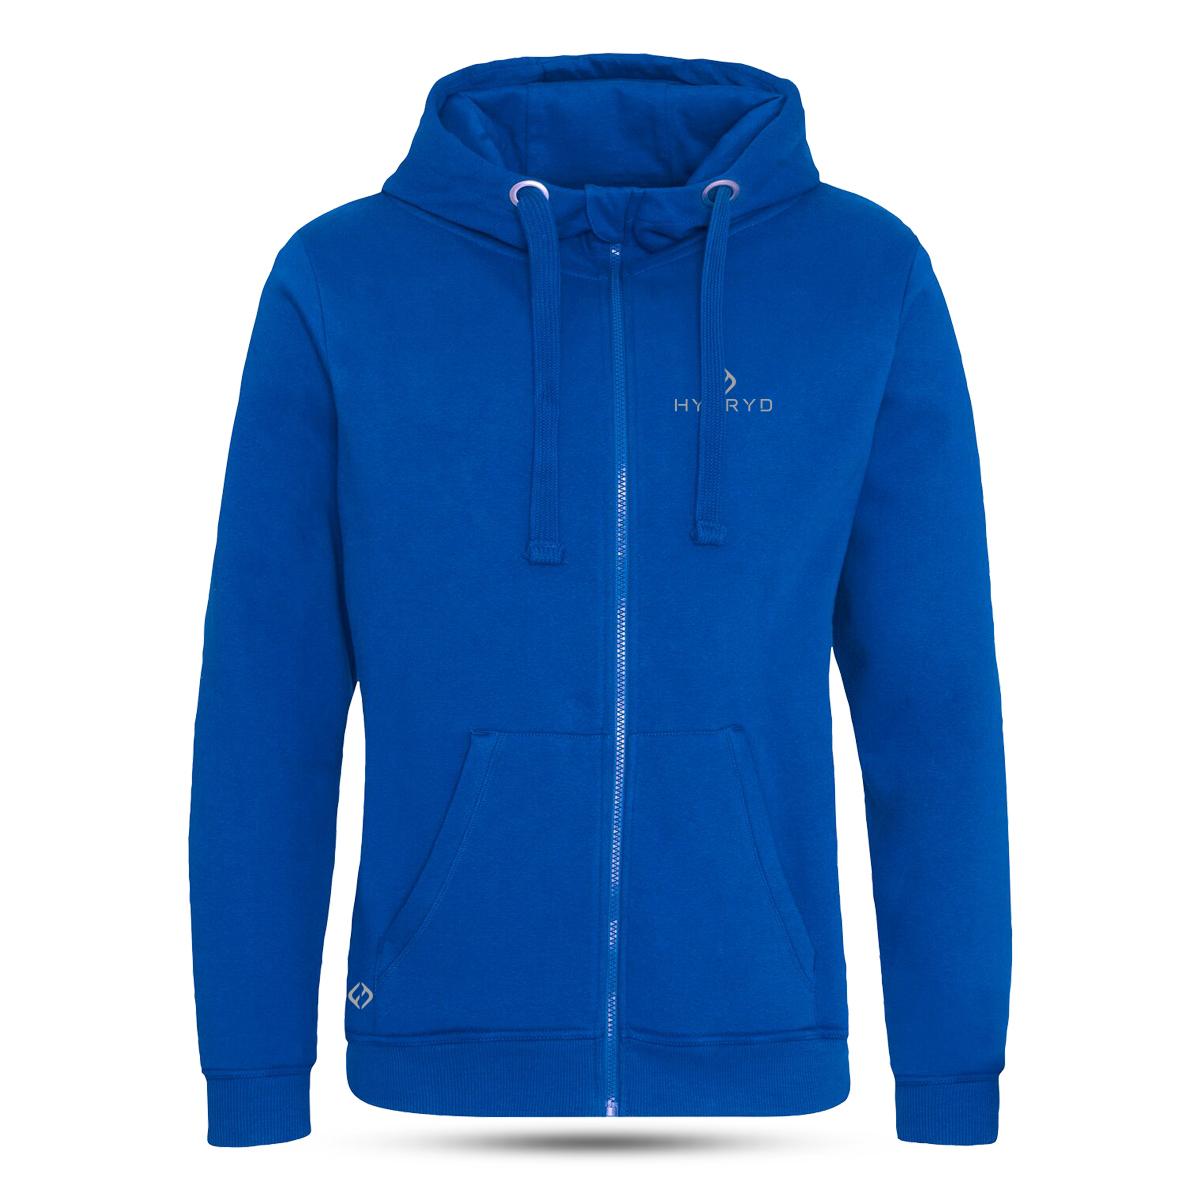 Mens Atlantic Hood - Cobalt Blue